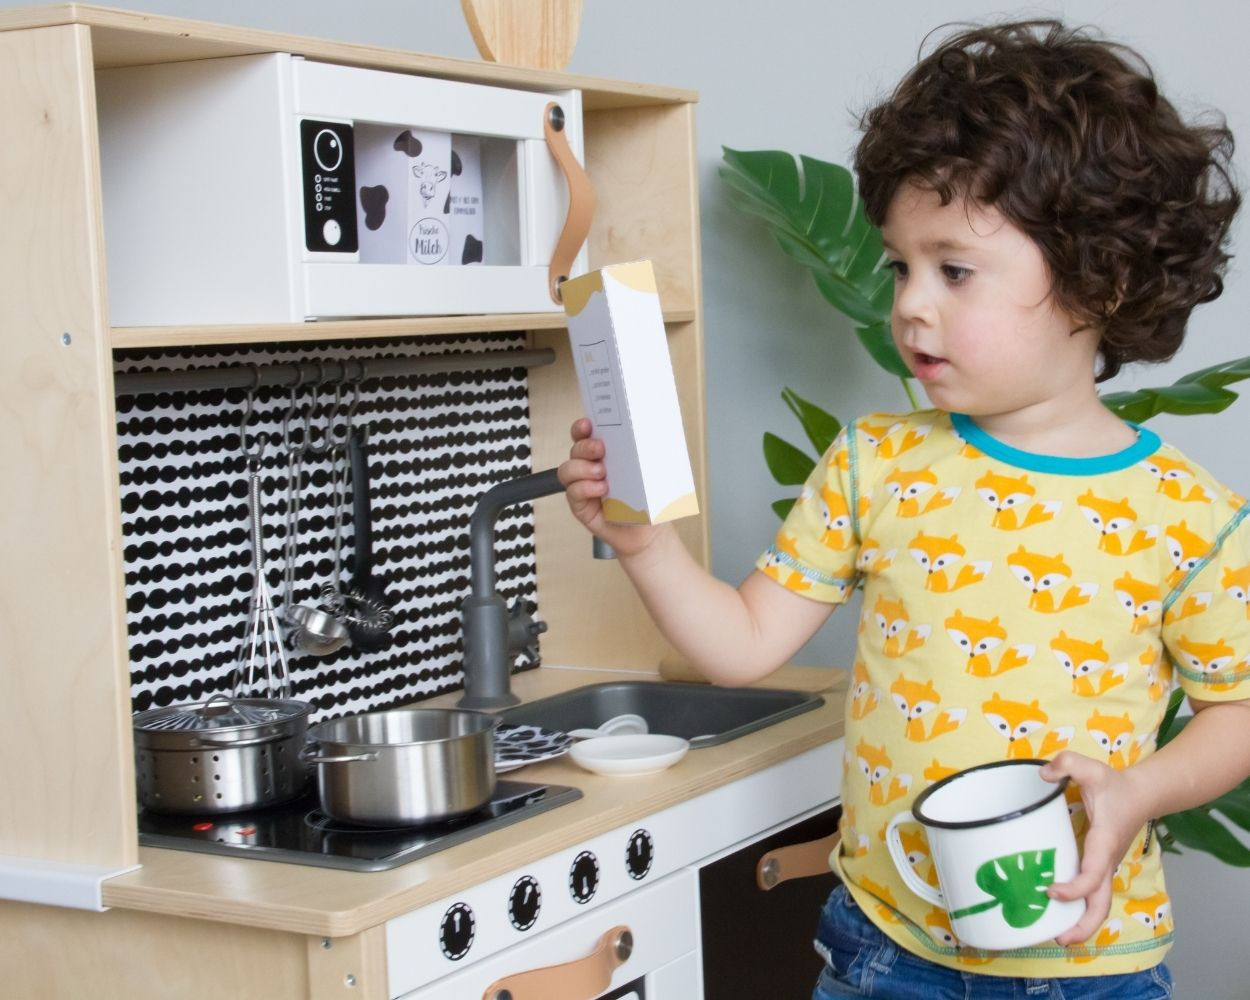 Vergleich Kinderküche Aldi Lidl Ikea